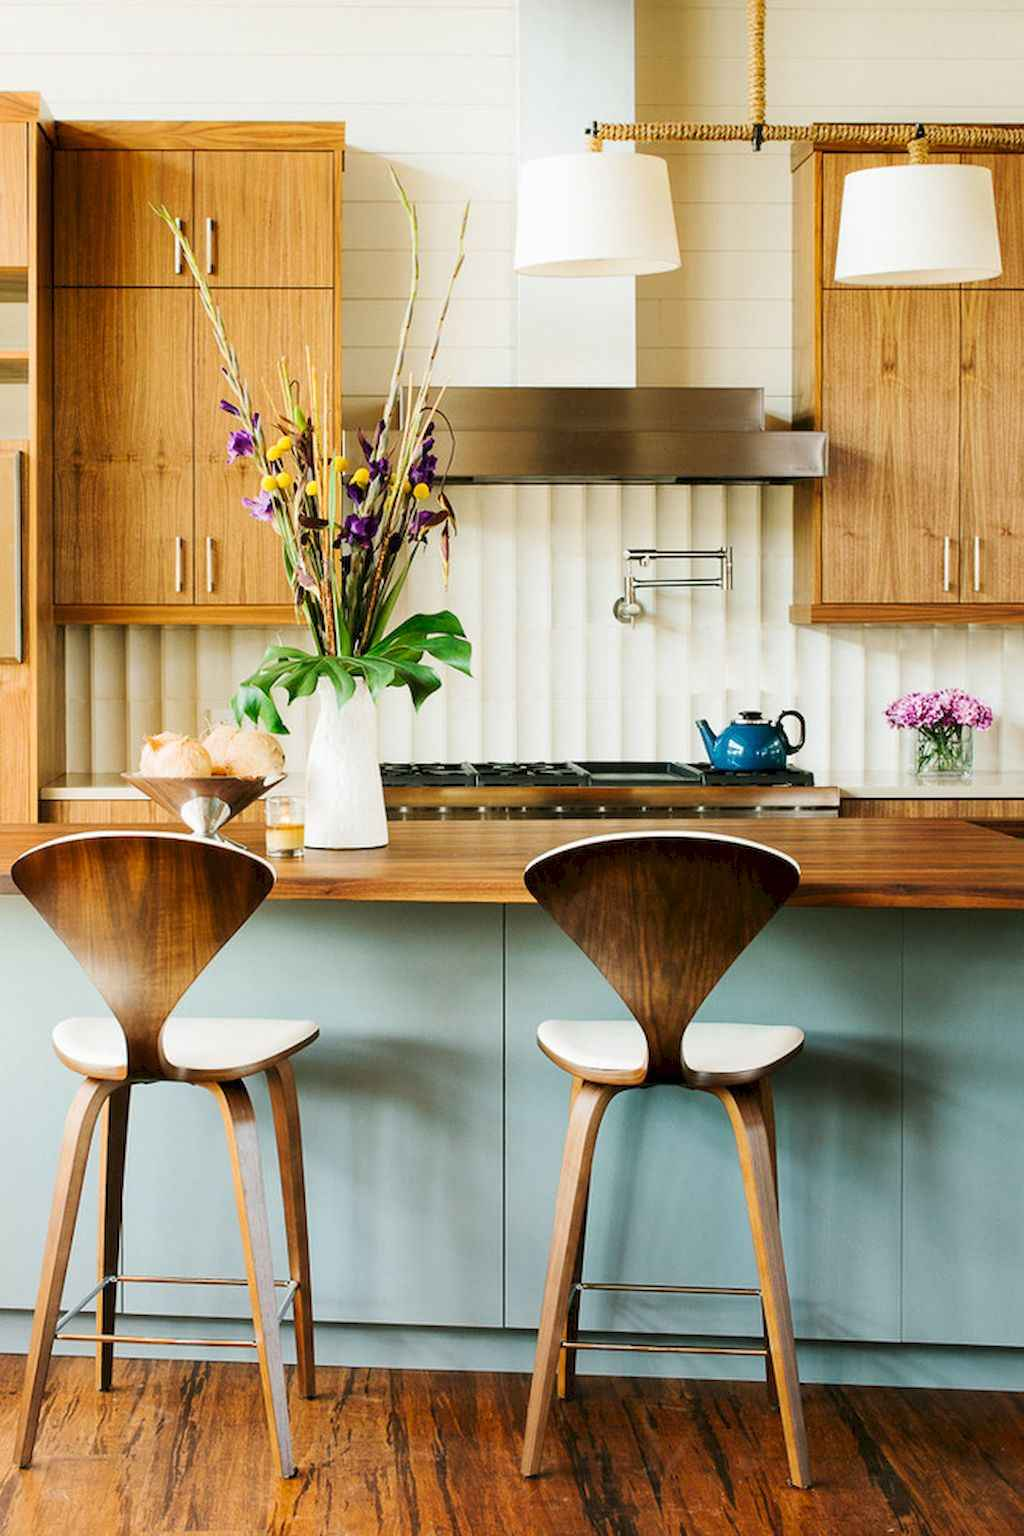 Mid century modern kitchen design ideas (13)